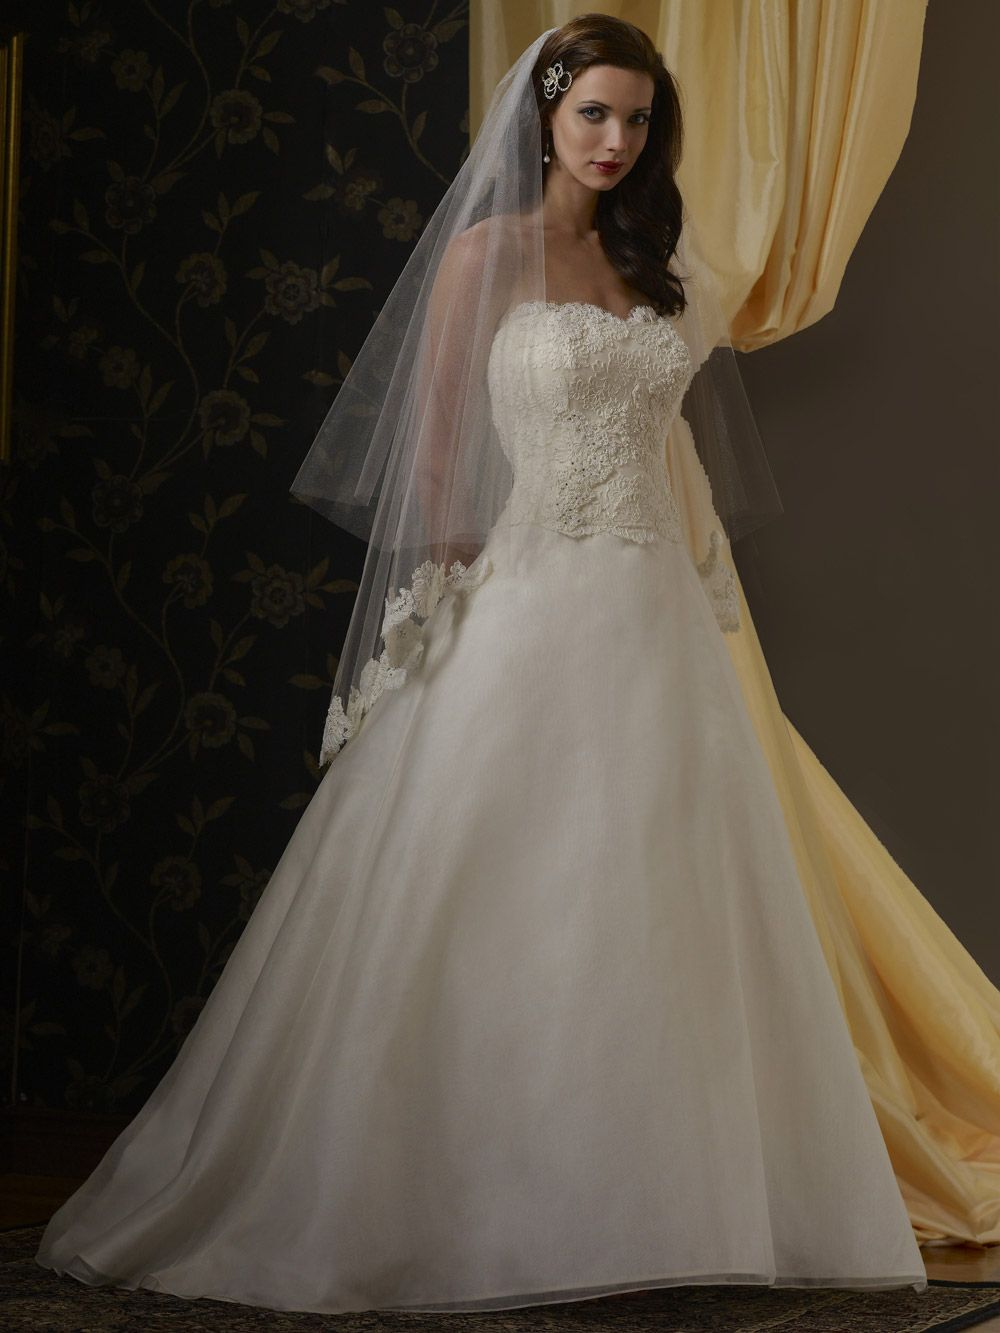 Wedding dress consignment shops near me  similar to the wedding dress I bought at a consignment bridal shop